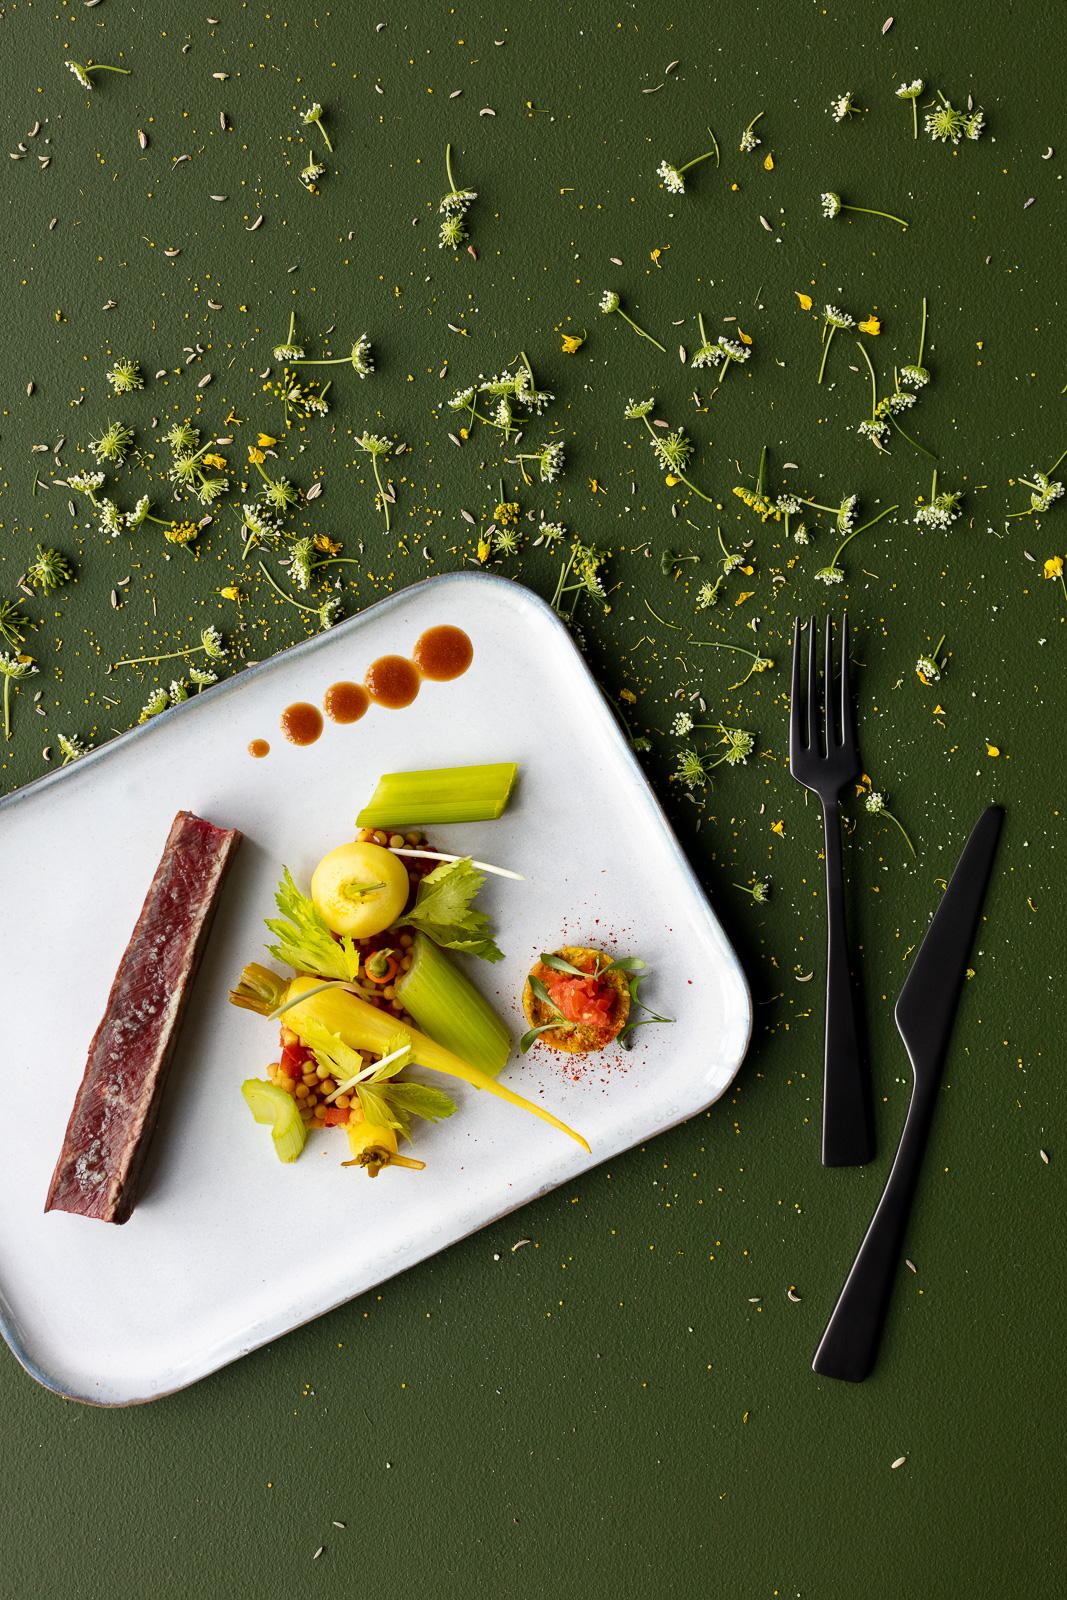 Franck_Hamel_food_photographer_photographeculinaire_valerie_paumelle_agent_st_clair_traiteur (1).jpg